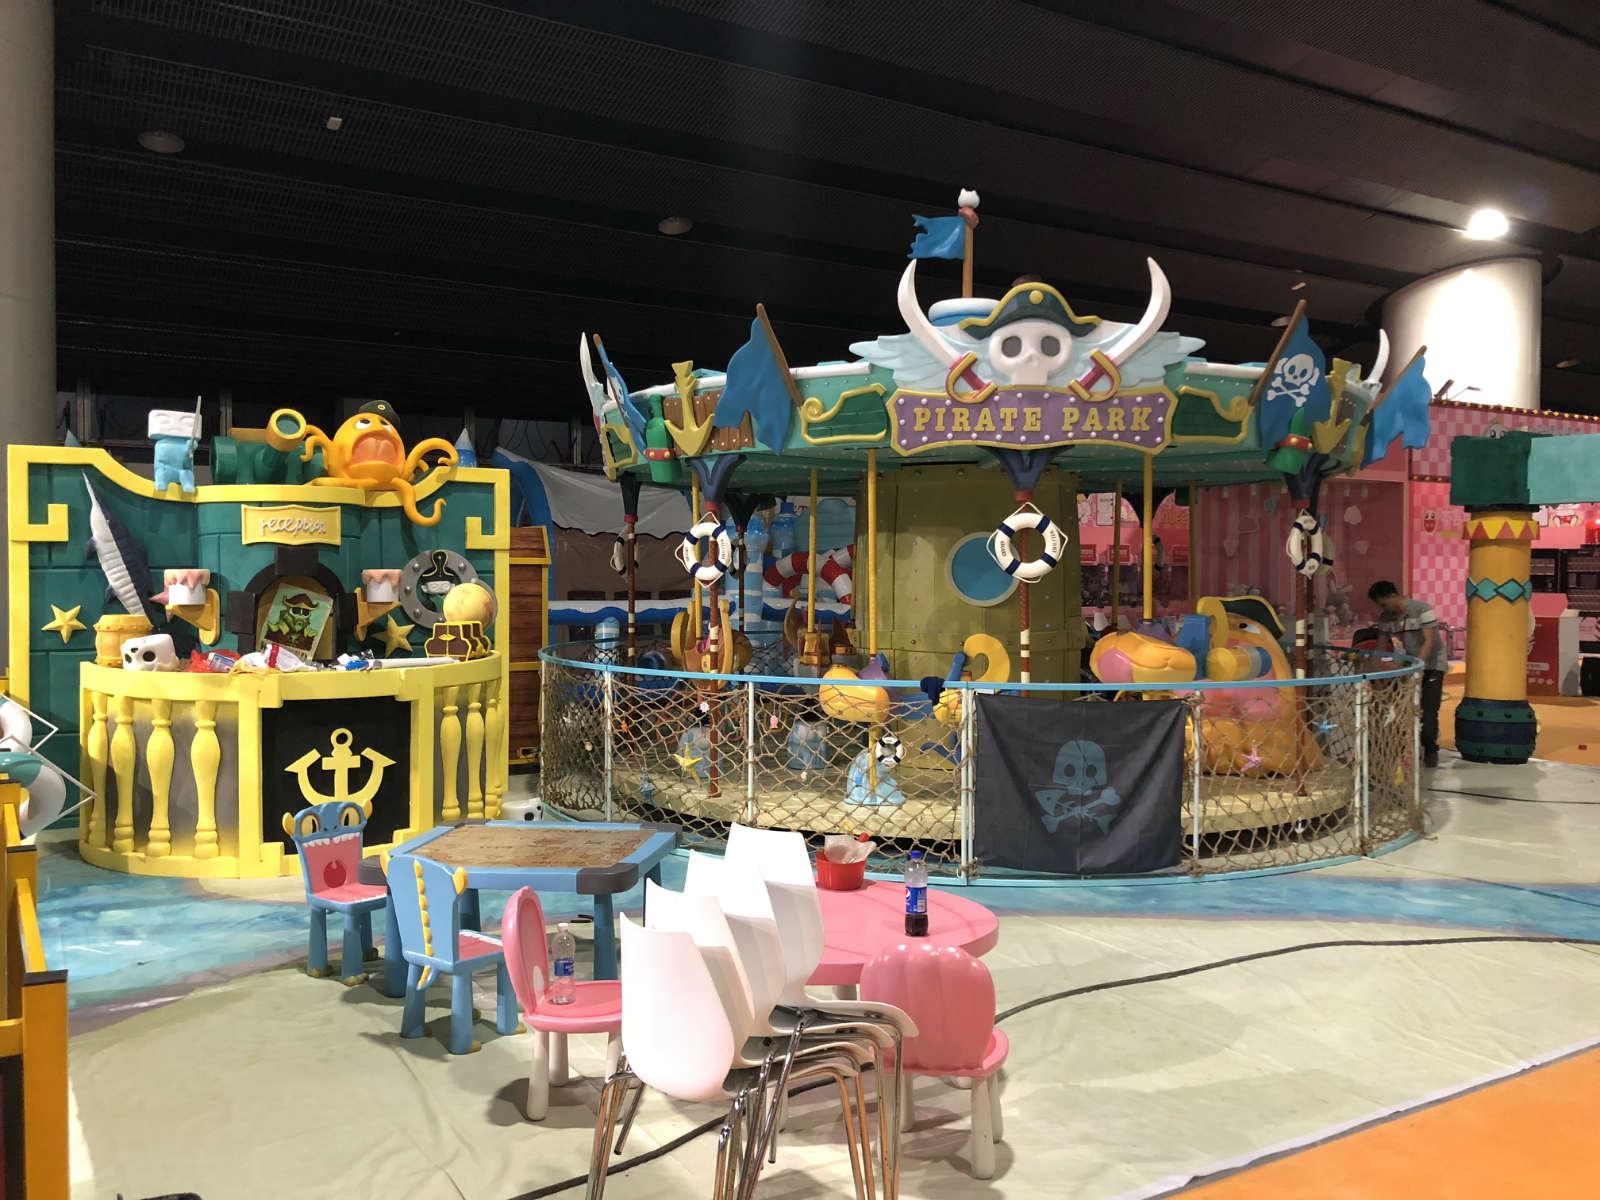 World Fun Attractions-High Quality Caribbeanisland-pirate Eddy Carousel | Carousel-4